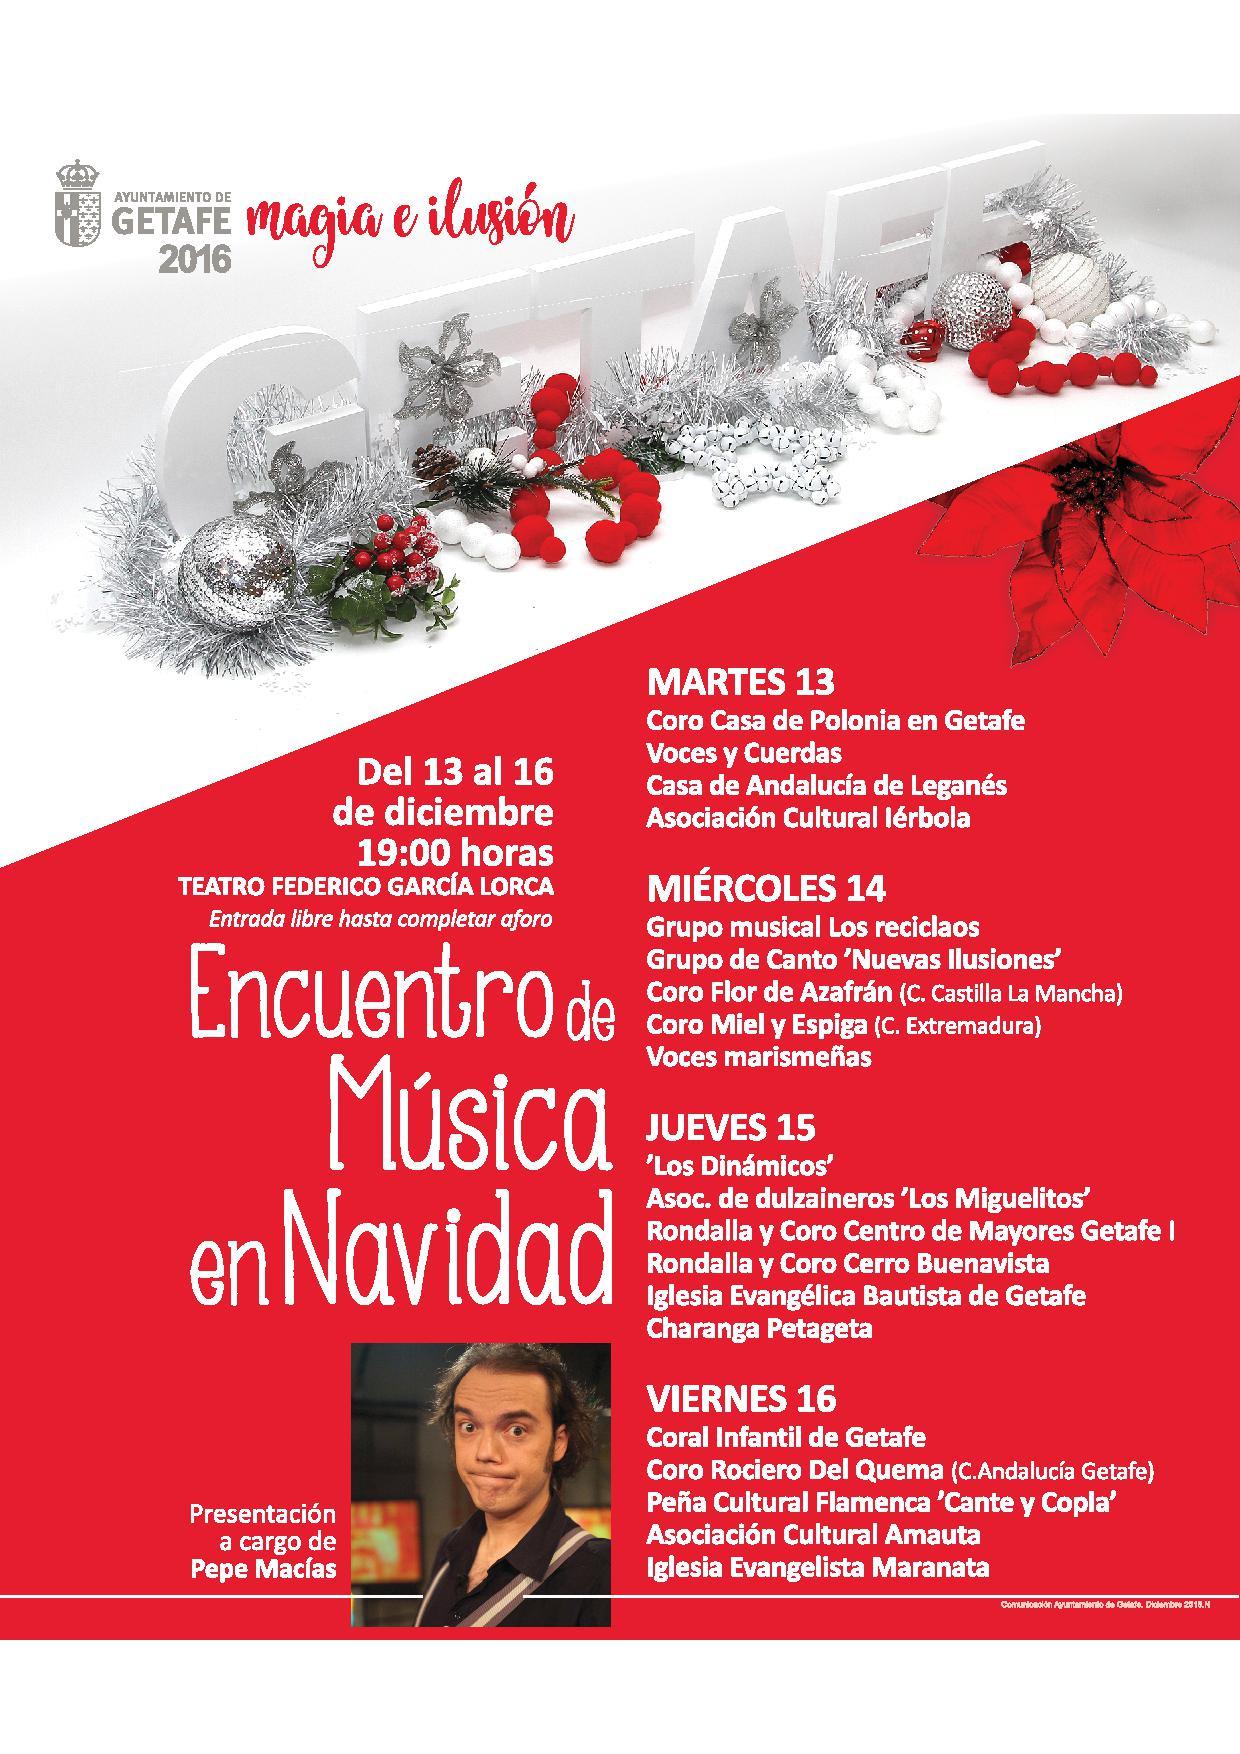 20161209_1000_cultura_encuentro_musica_navidad_cartel_vitrina_teatro_650x800_ok